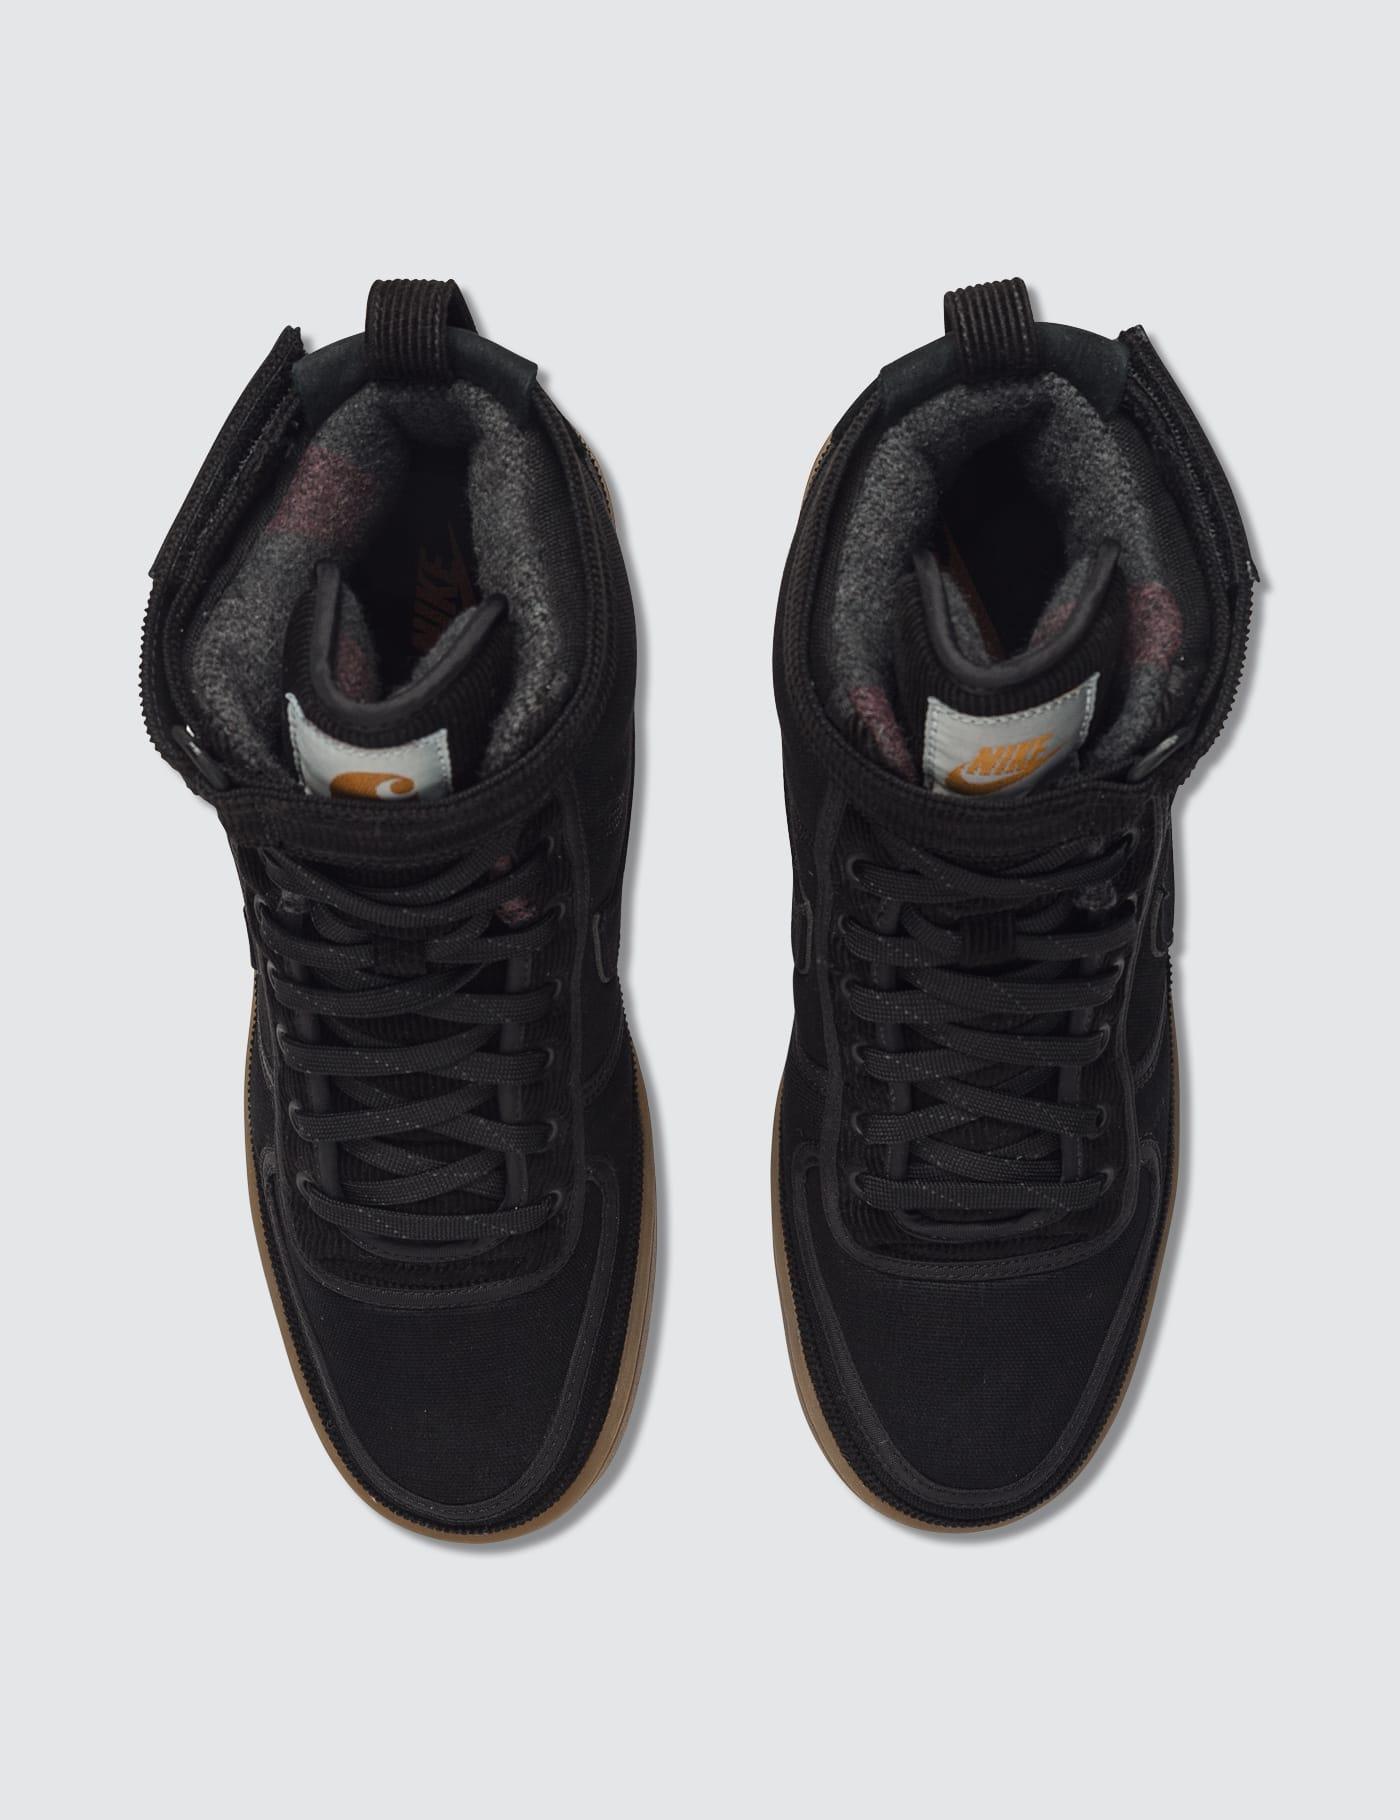 Nike - Vandal High Supreme Prm Wip   HBX